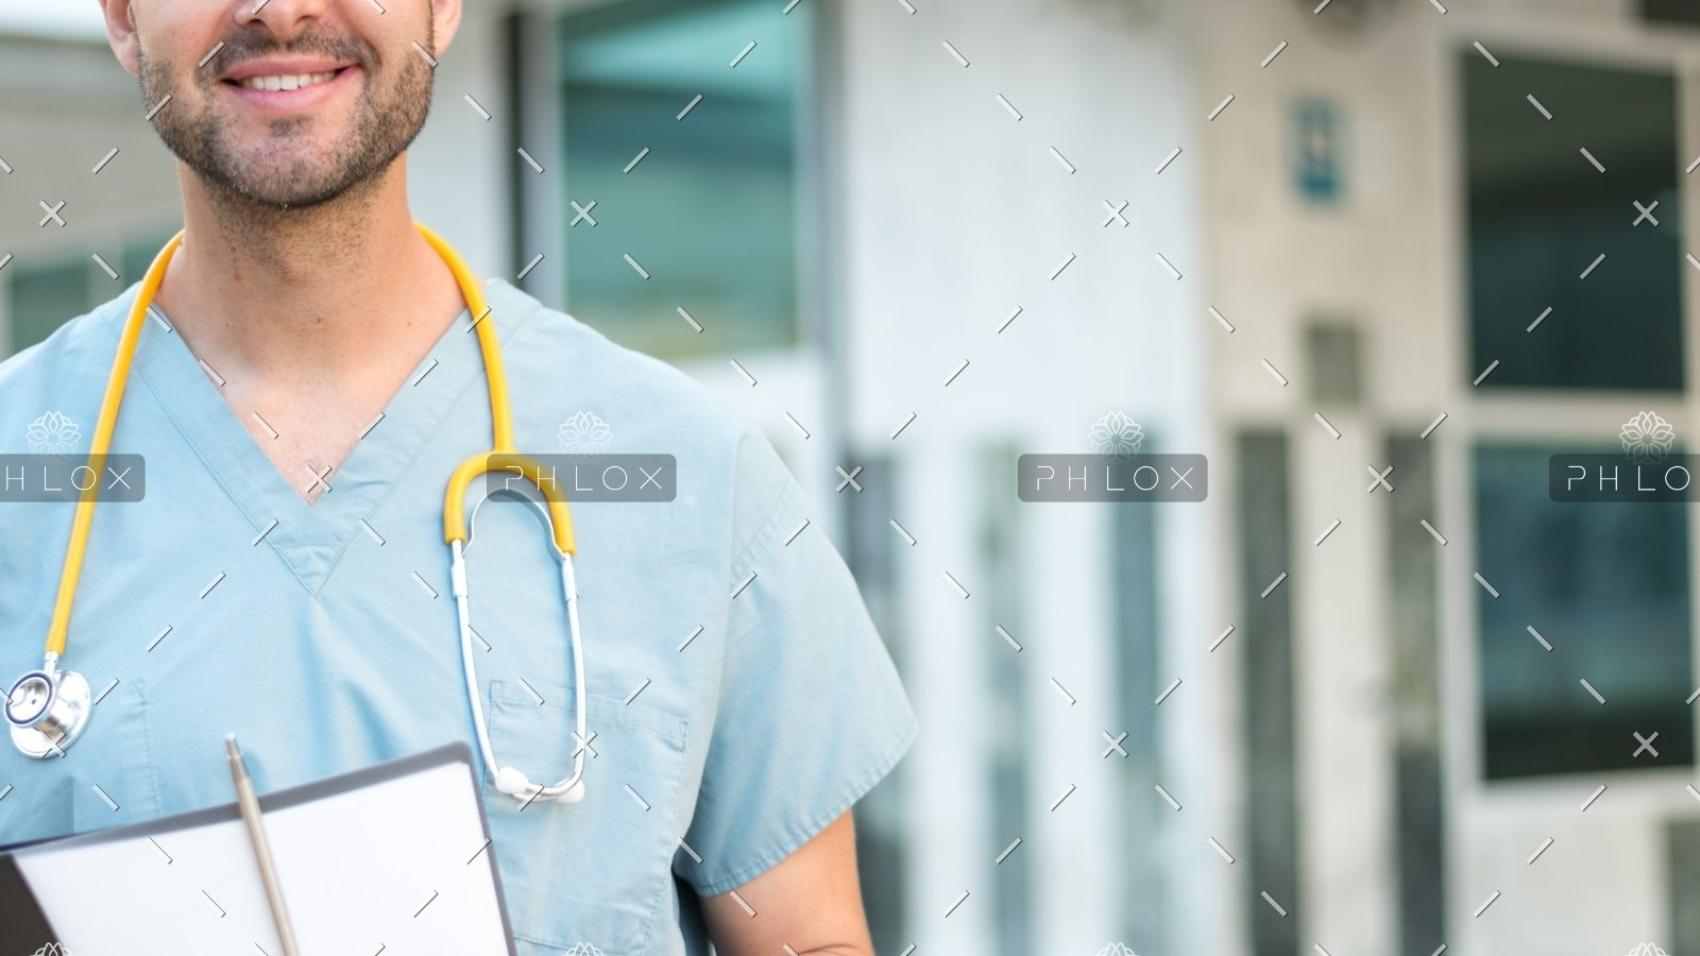 demo-attachment-183-male-nurse-with-stethoscope-MBQ4P3Y